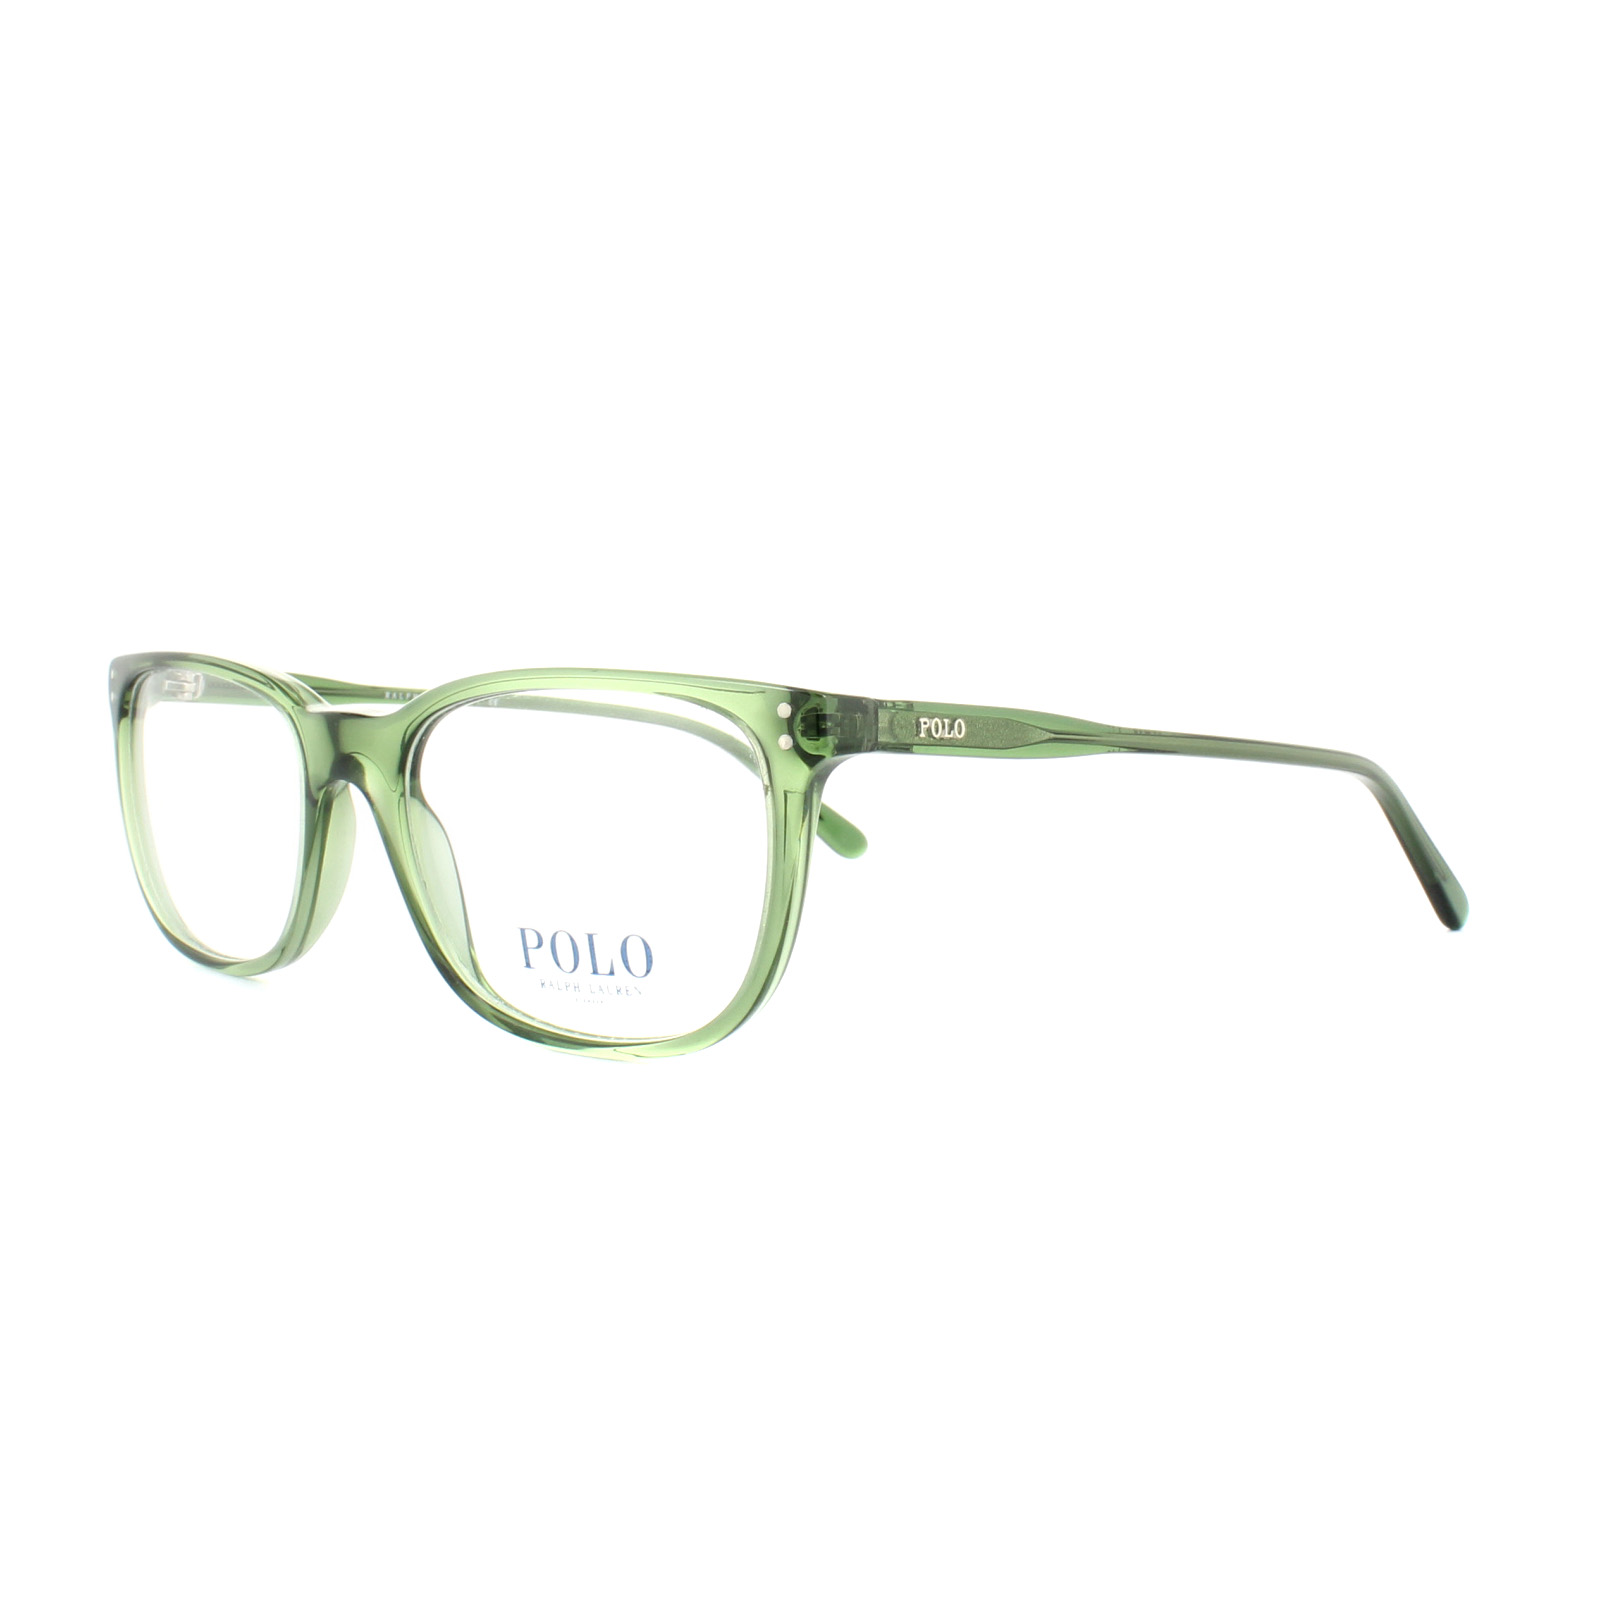 Glasses 2156 Lauren Polo Ph Ralph Frames 8nwv0NmO